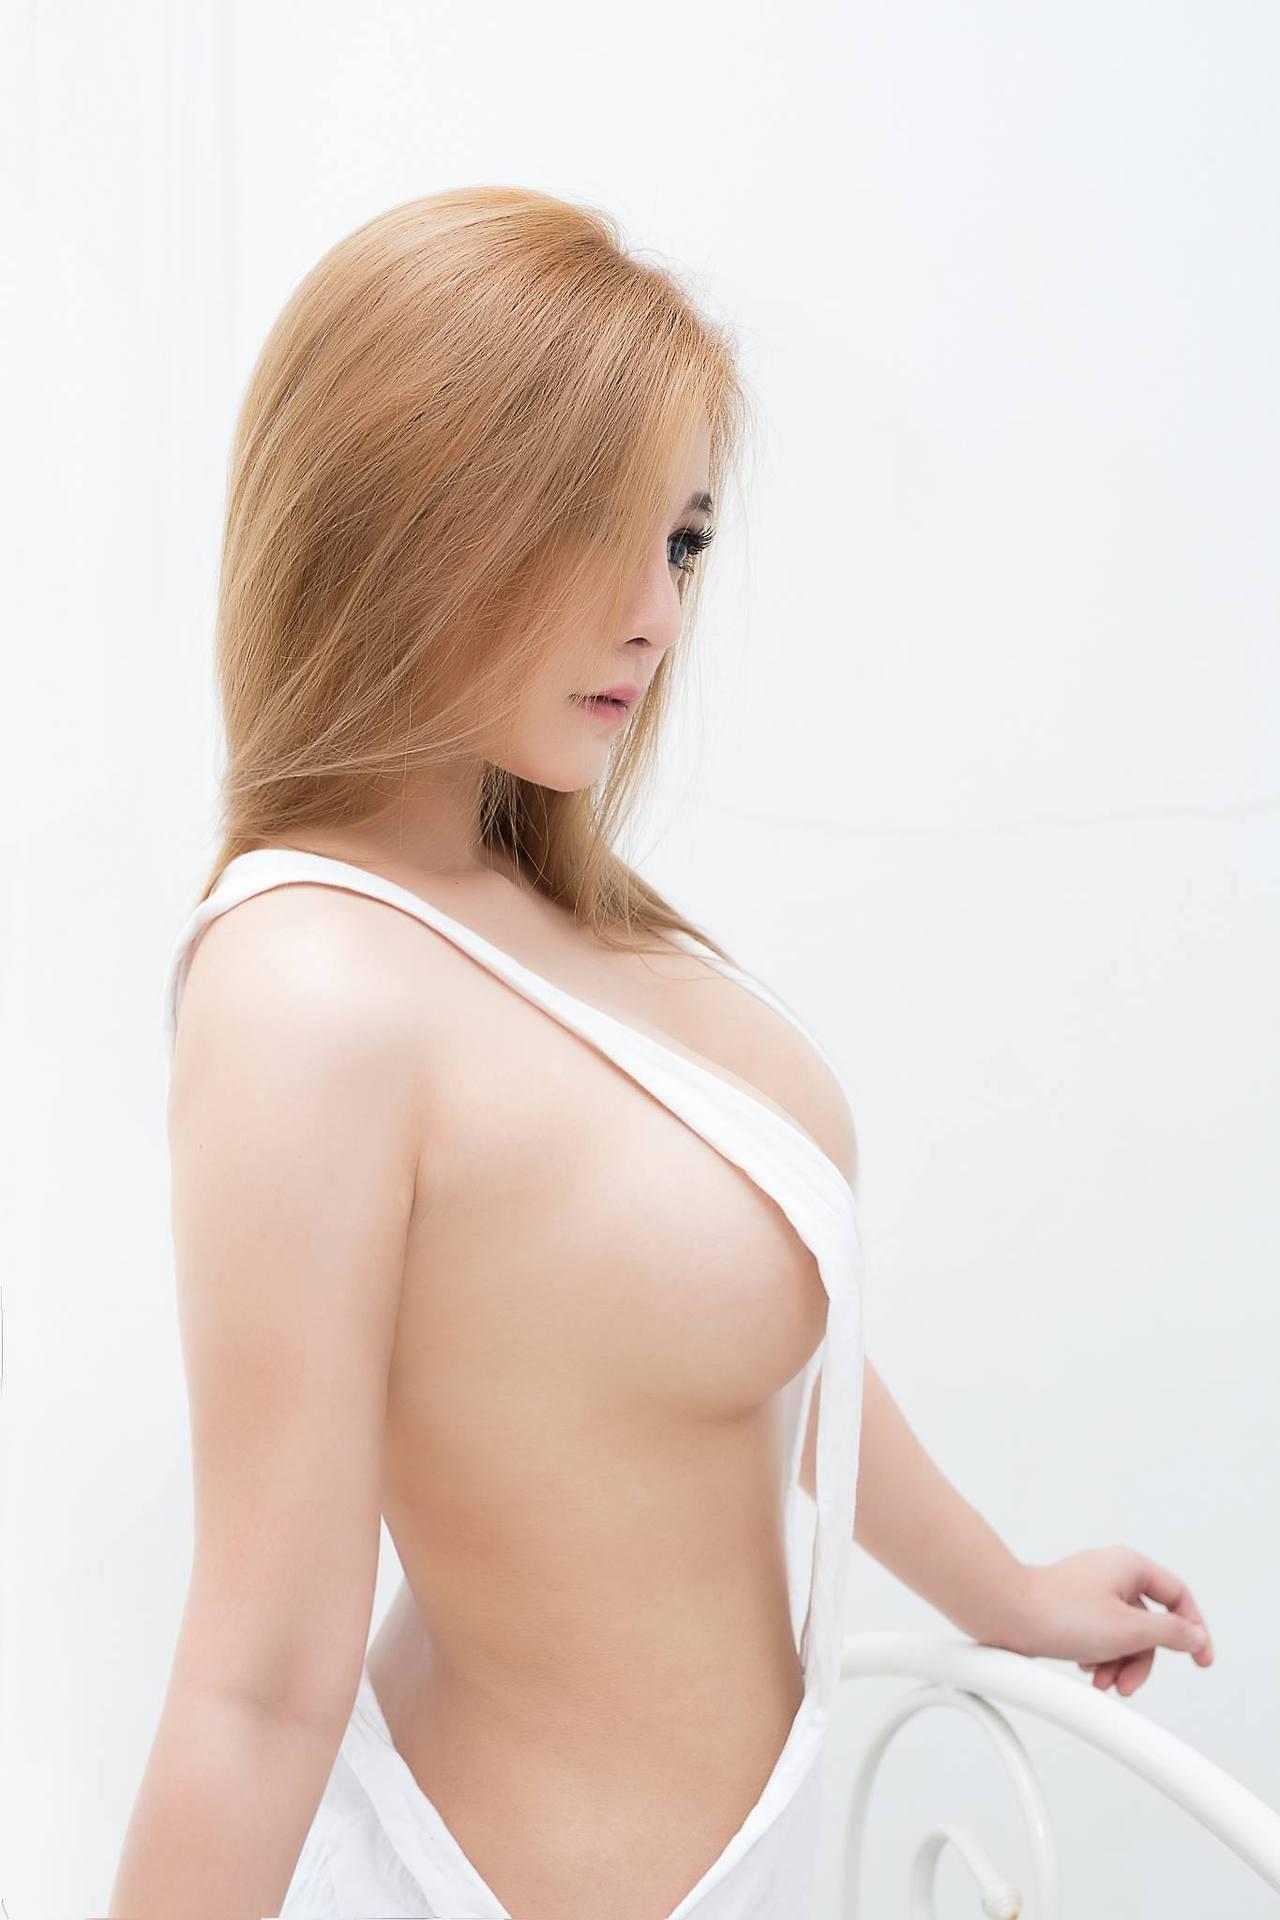 Asian women meme porn stars  asian sexy girls webcam sexy free